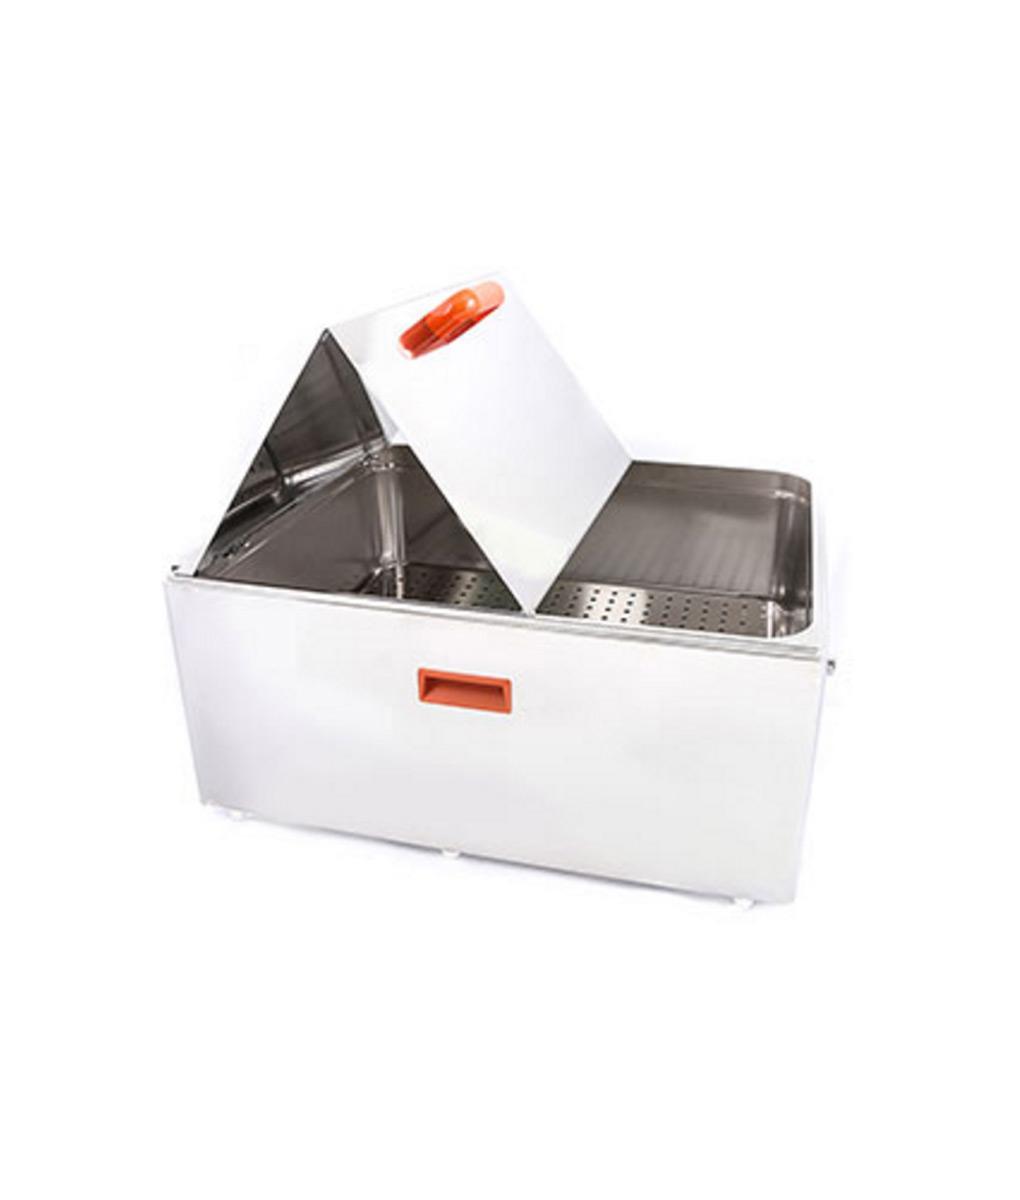 Unstirred Digital Bath 56 Litre by Clifton – end control bi-fold lid version Electrical